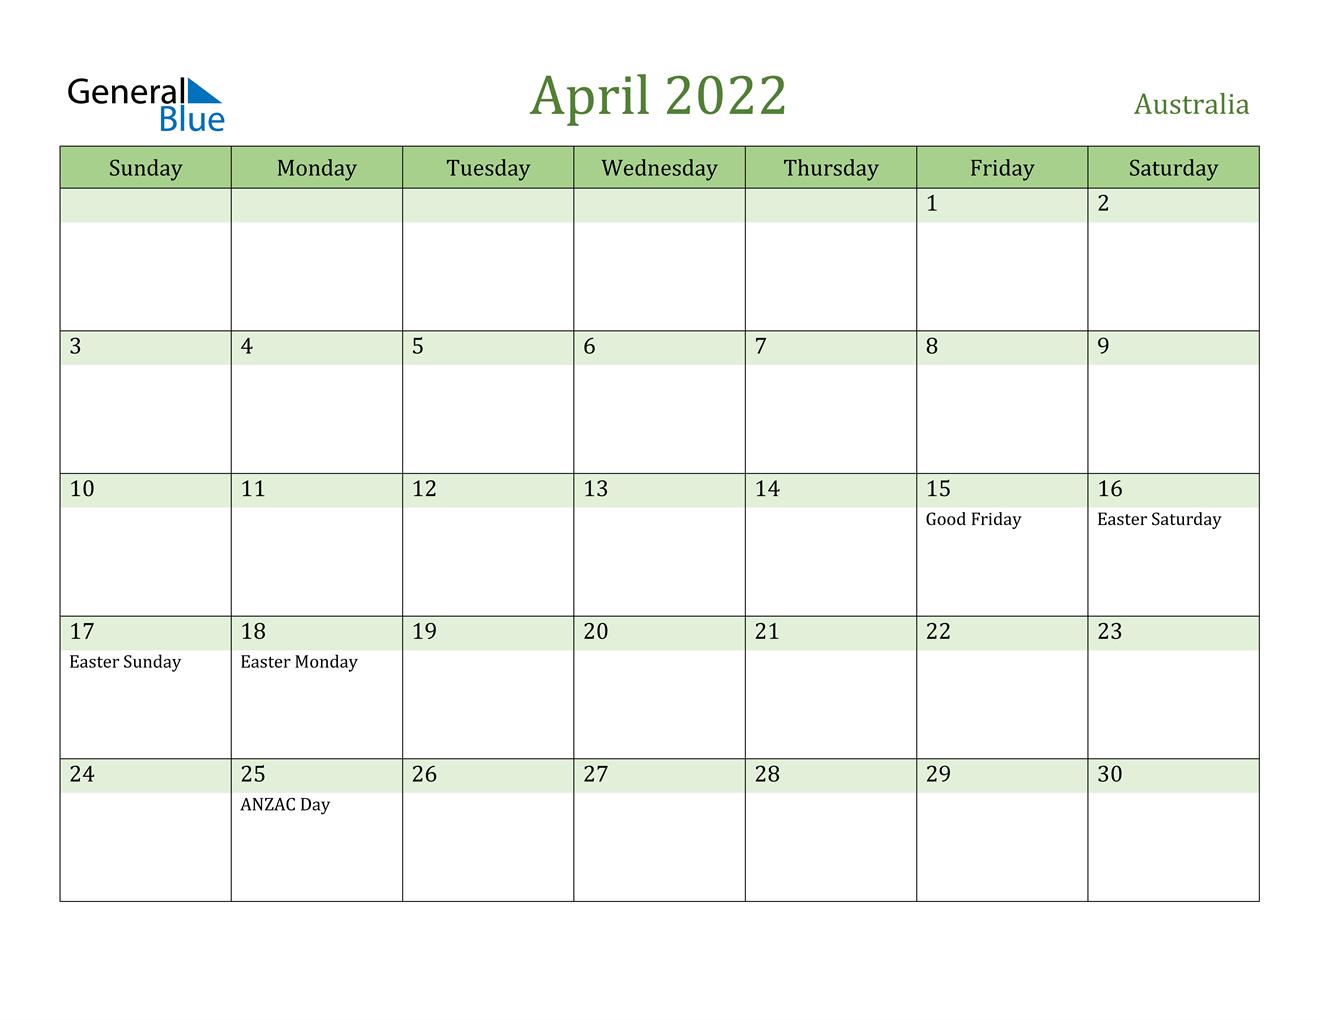 April 2022 Calendar - Australia intended for April 2022 Printable Calendar Free Photo